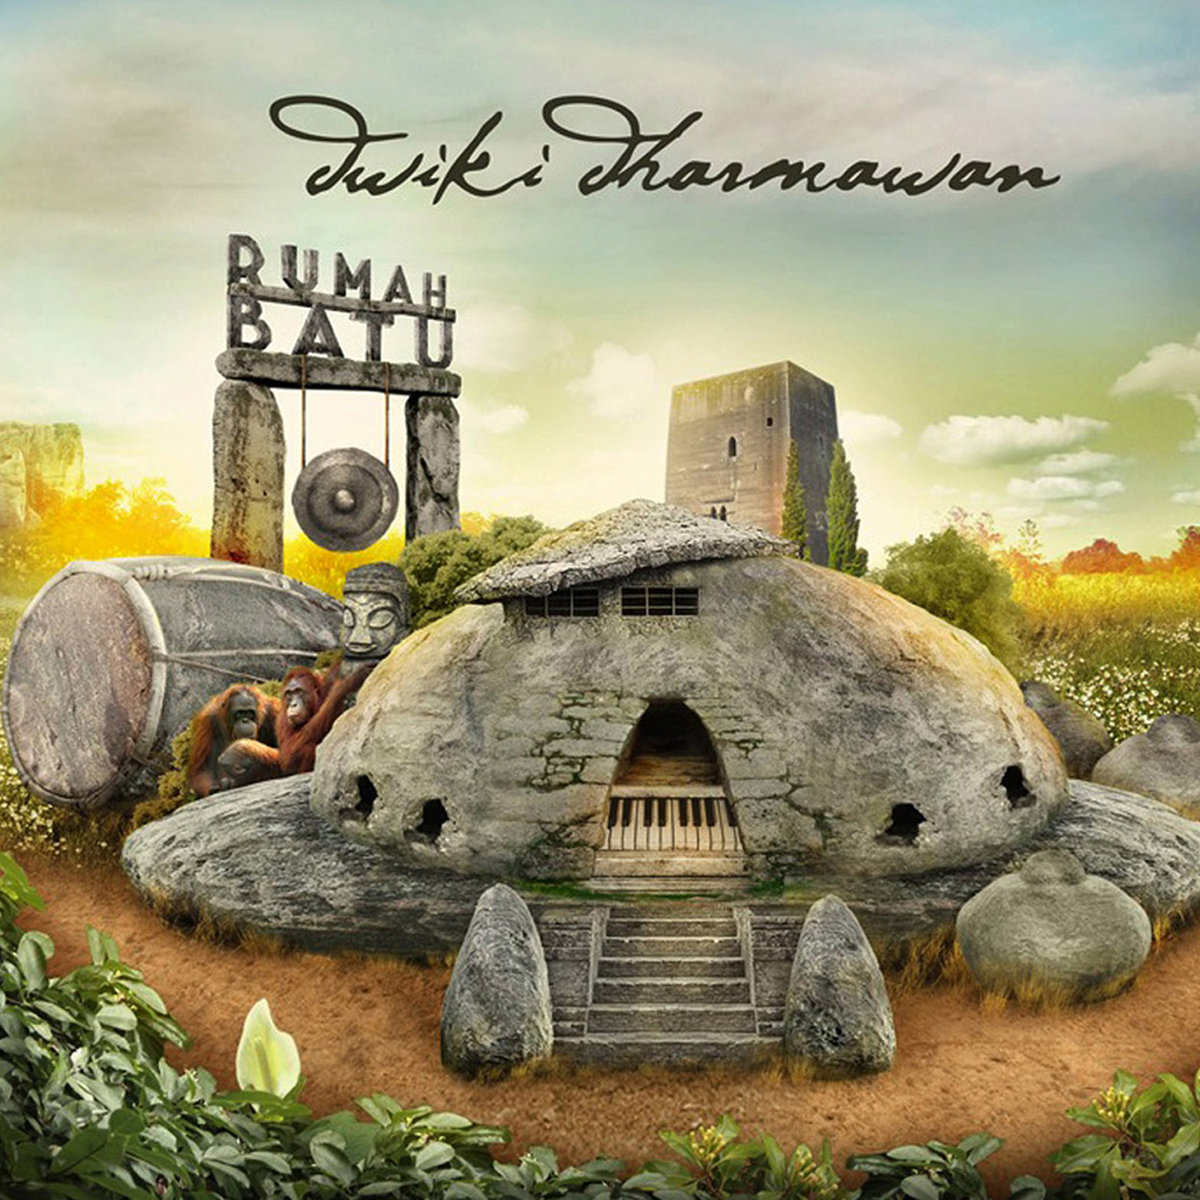 DWIKI DHARMAWAN - Rumah Batu cover